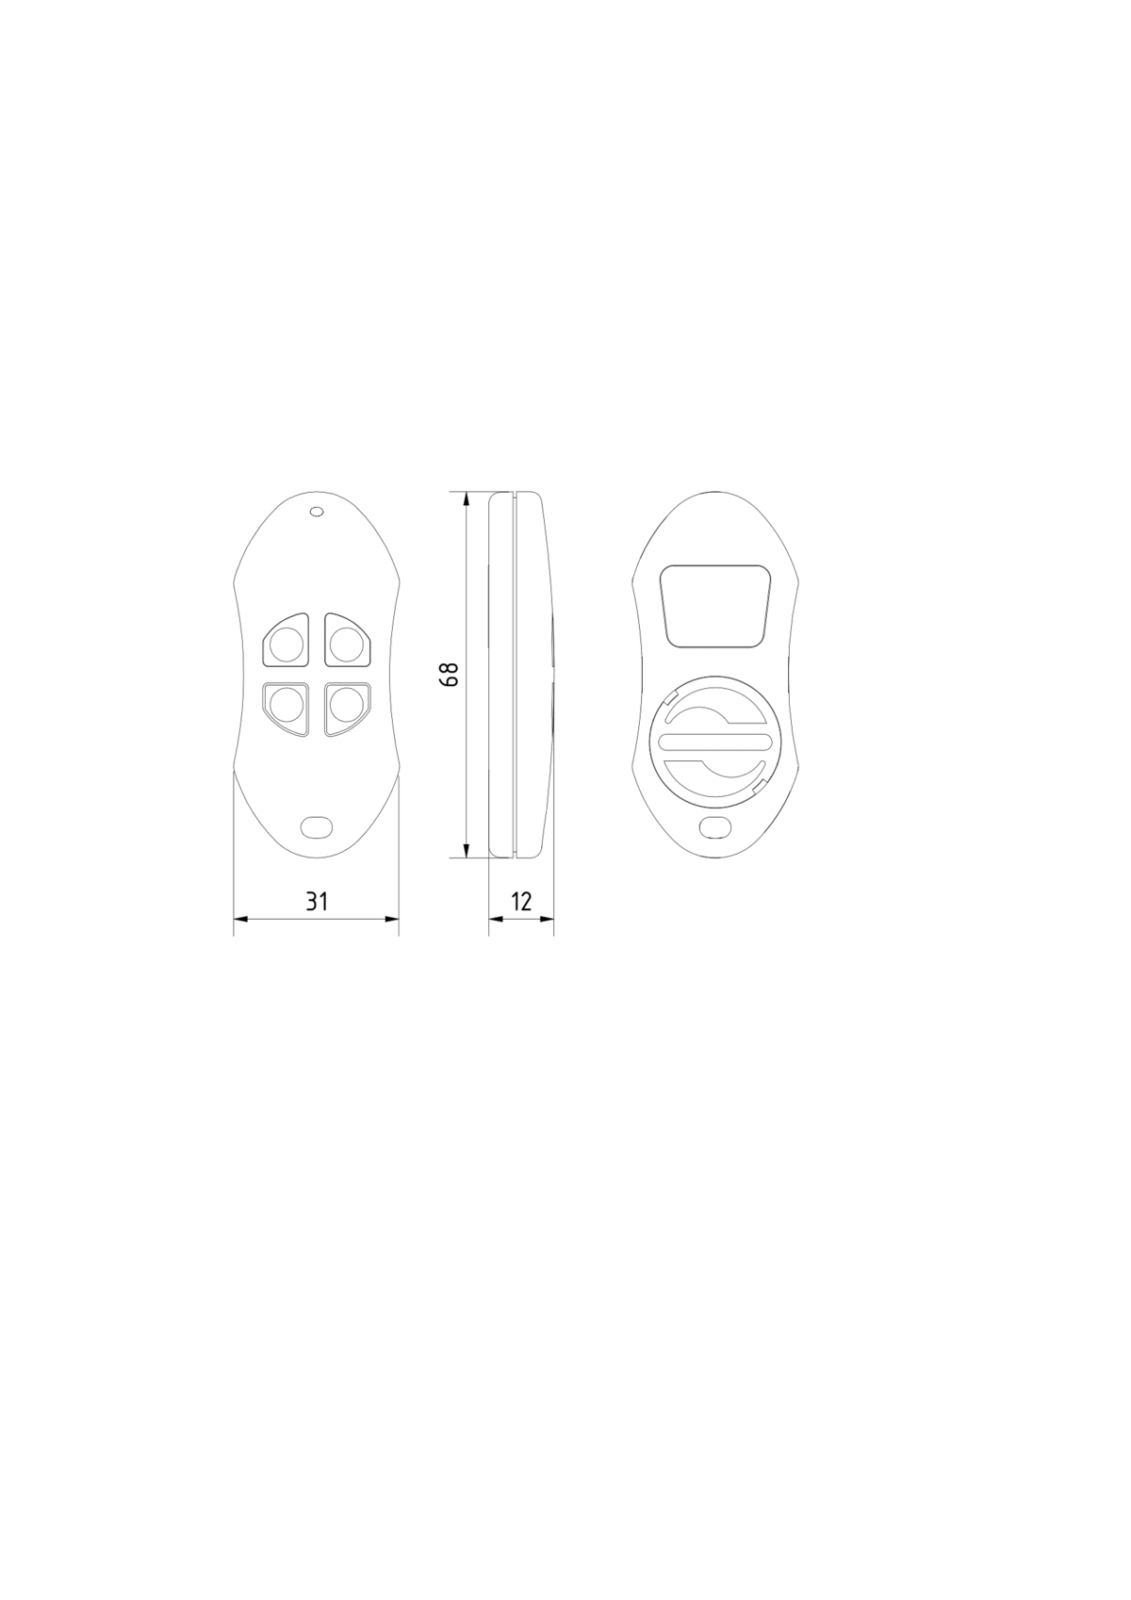 funksysteme_2kanalhandsendermicro-skizze